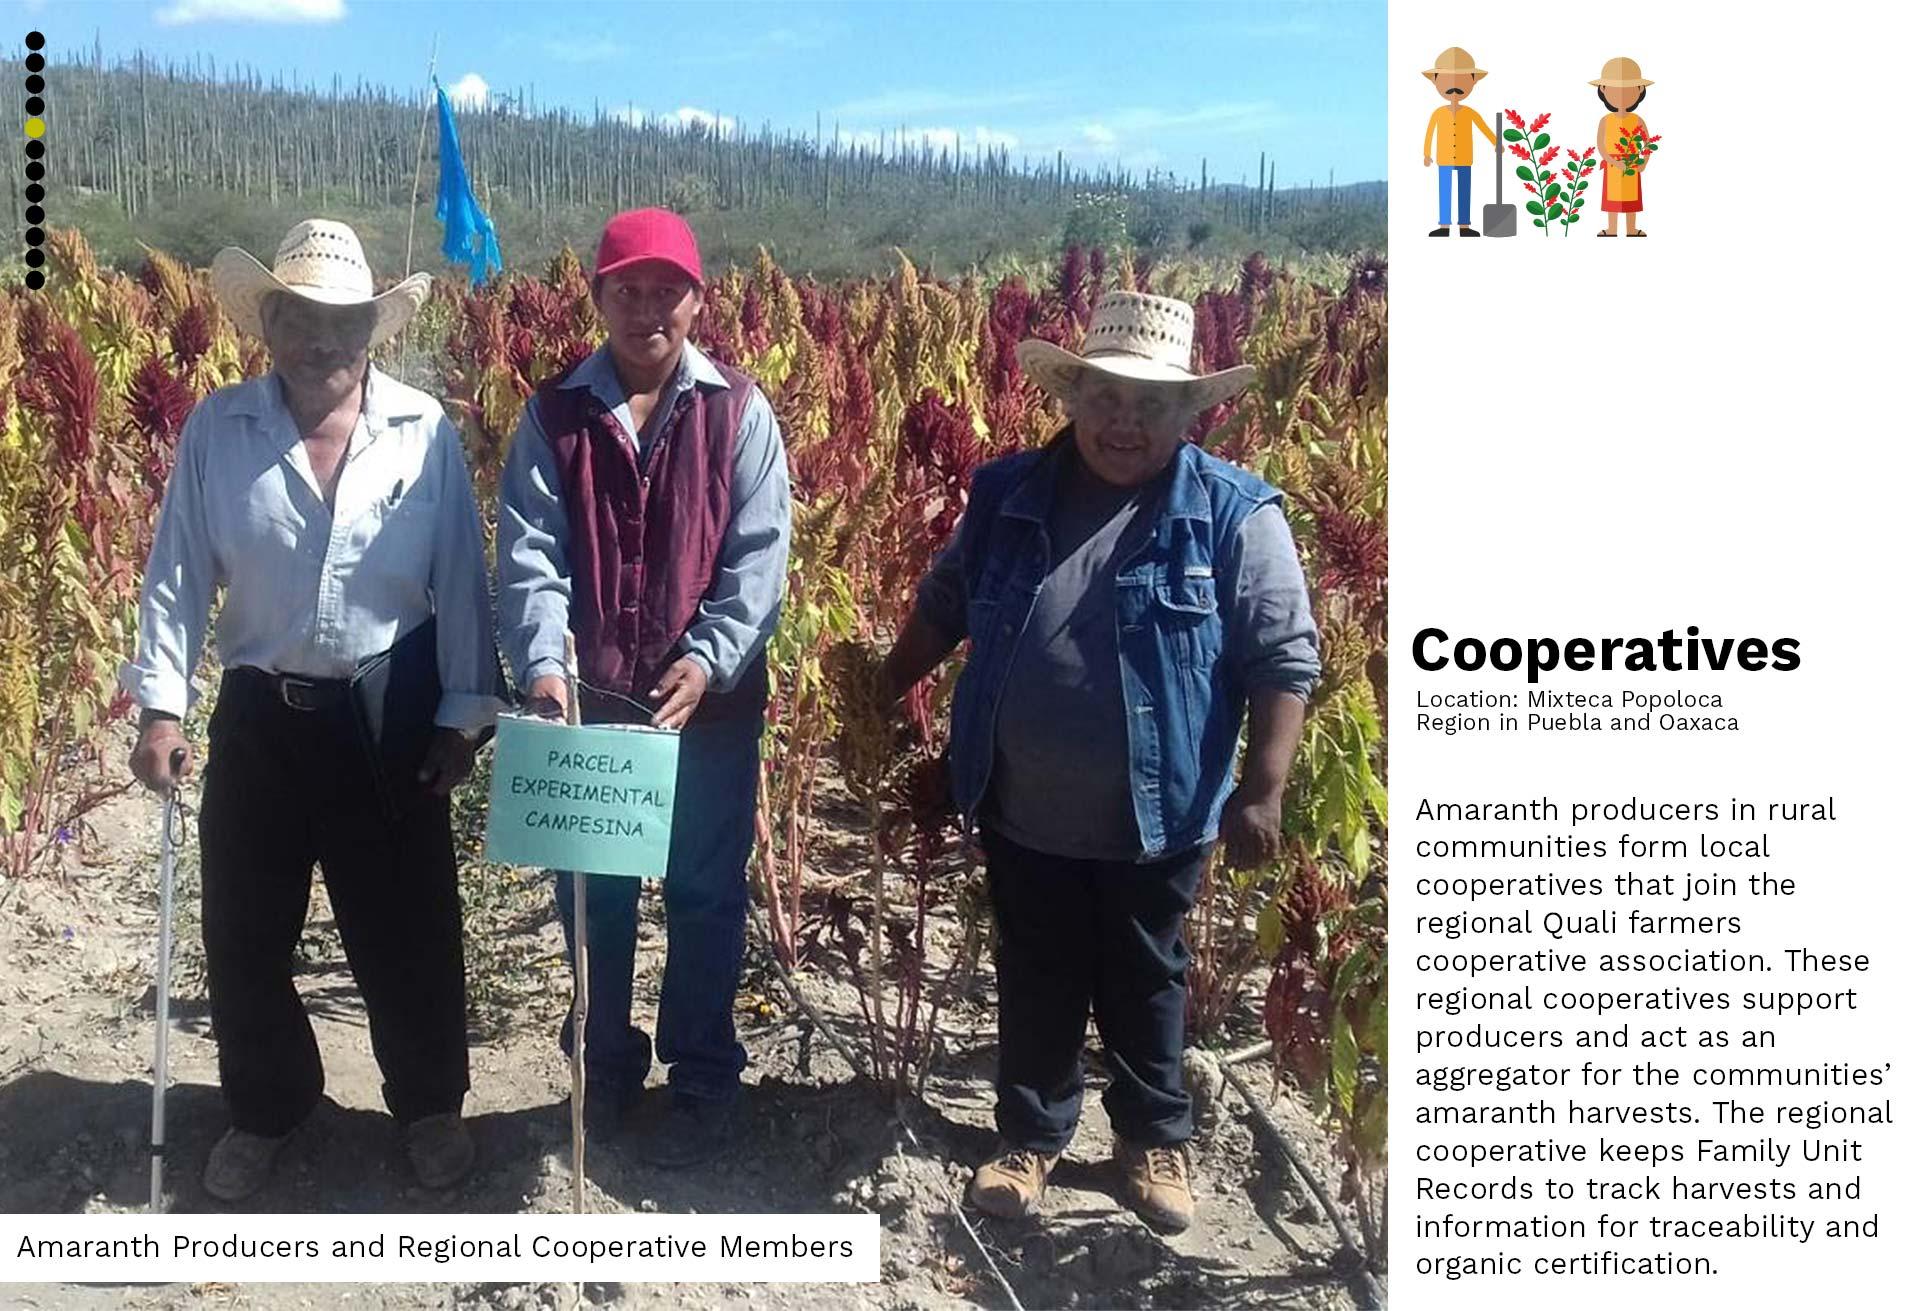 03a-Cooperatives